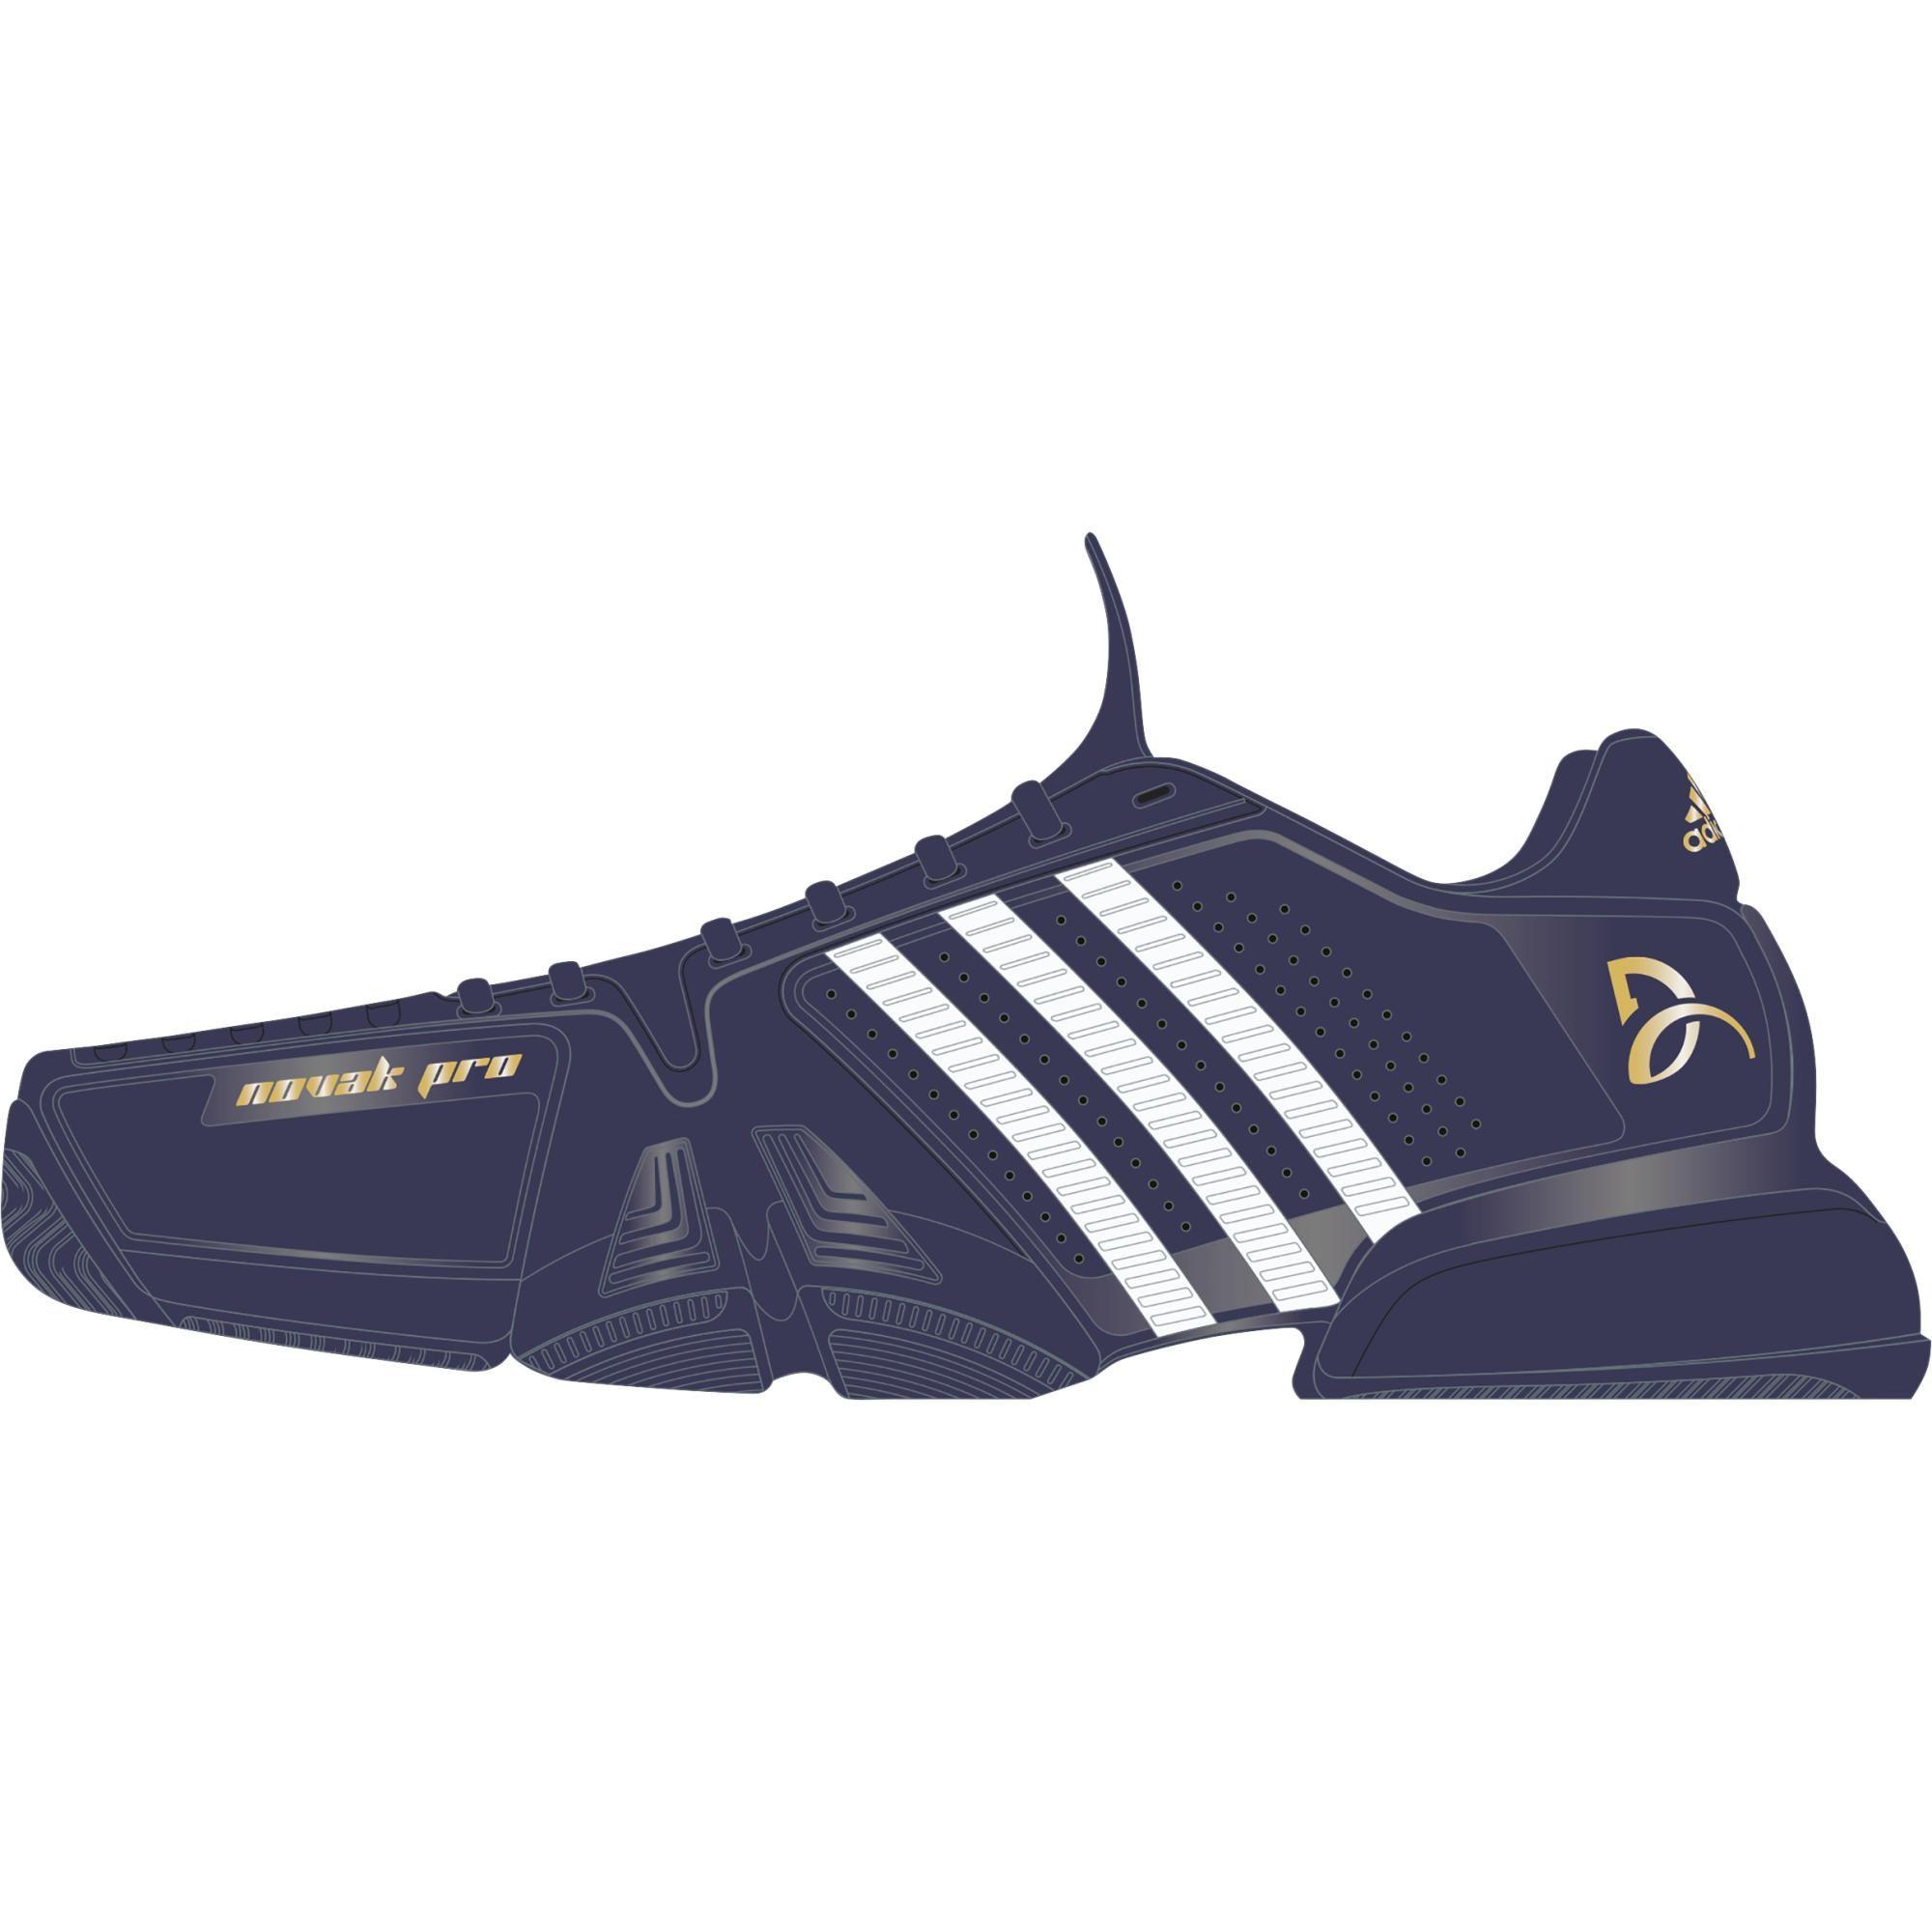 chaussure de tennis hommes adidas